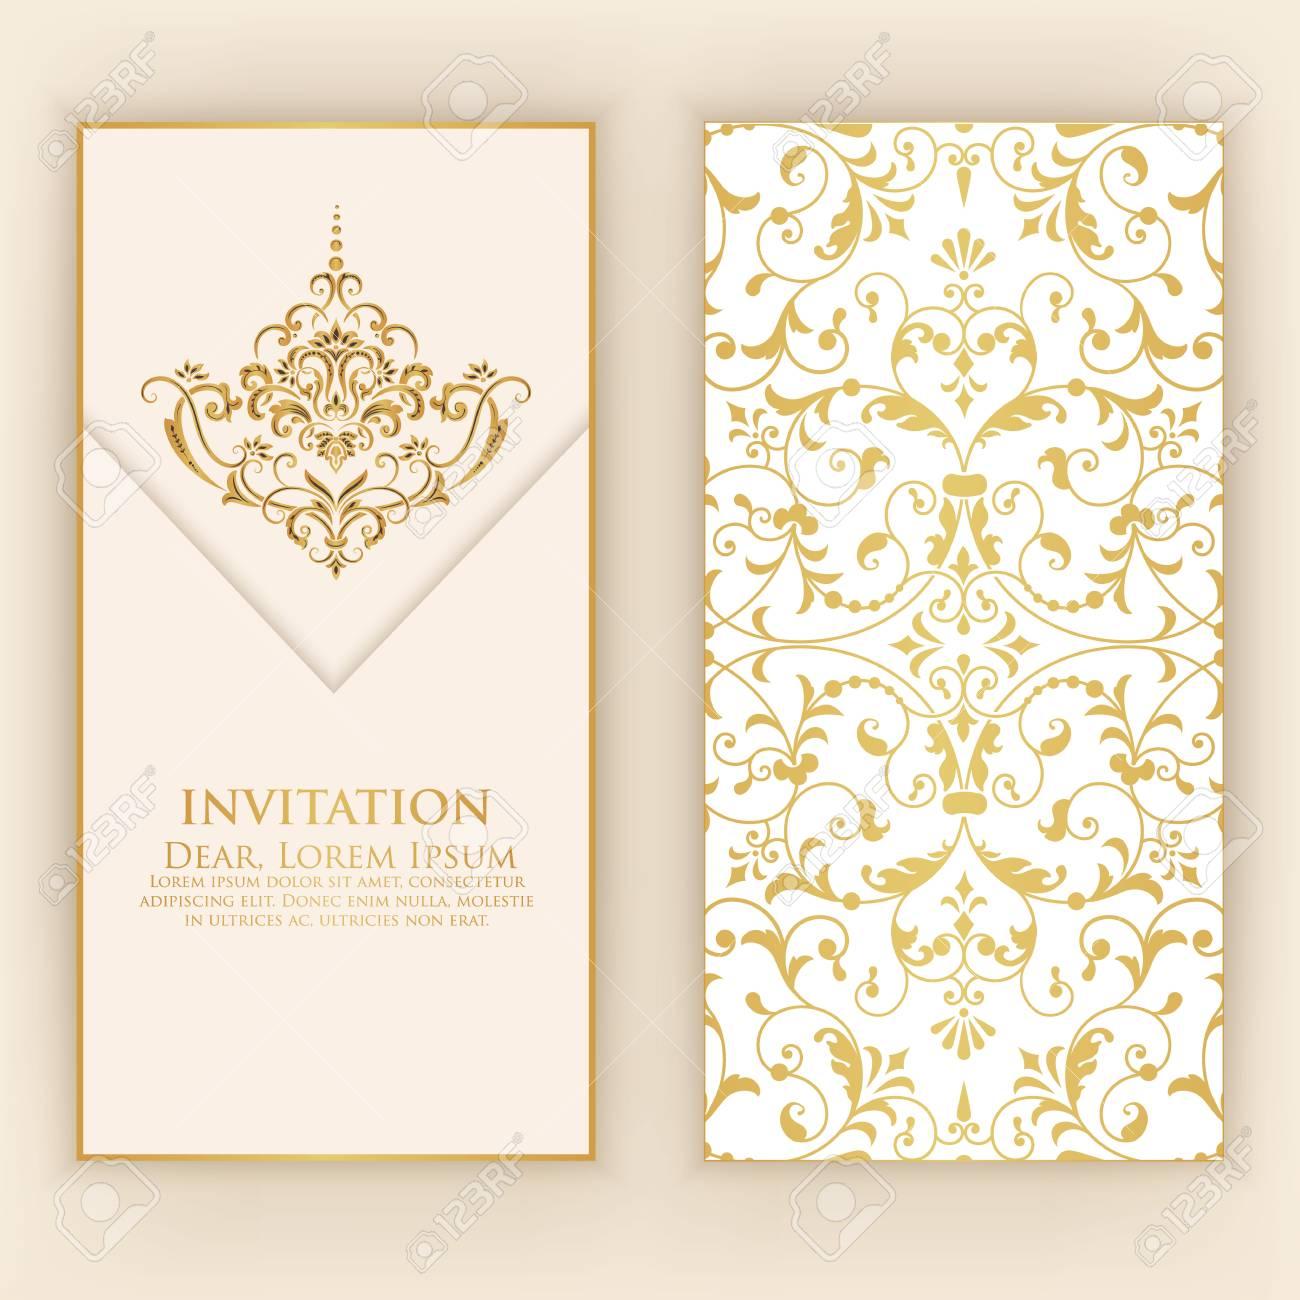 Invitation Cartes Avec Des Lments Arabesques Ethniques